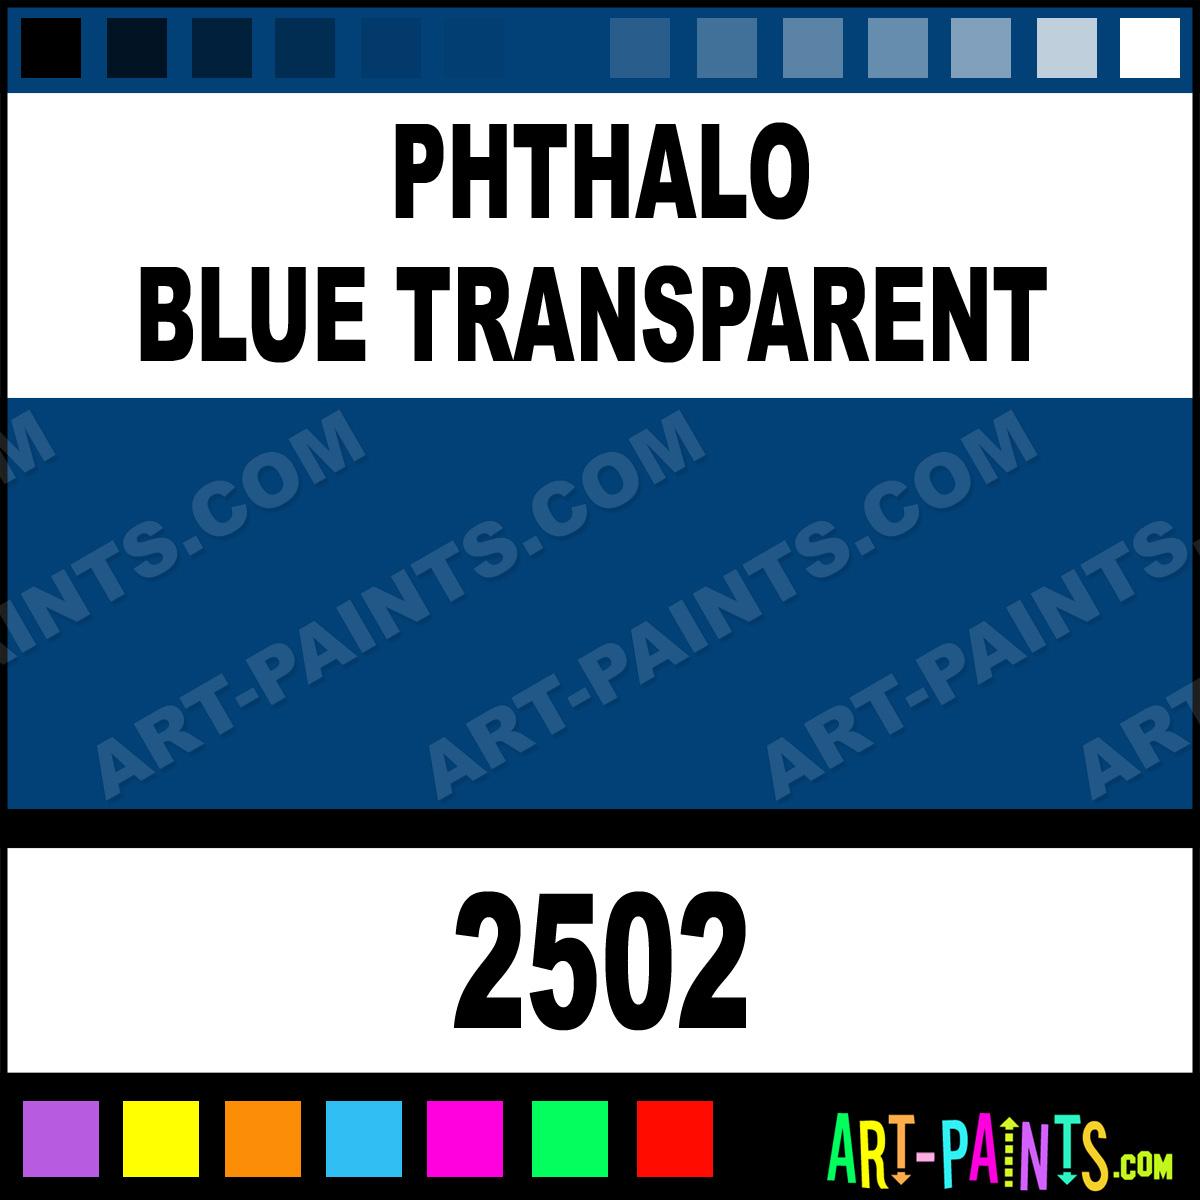 Phthalo Blue Transparent Delta Acrylic Paints 2502